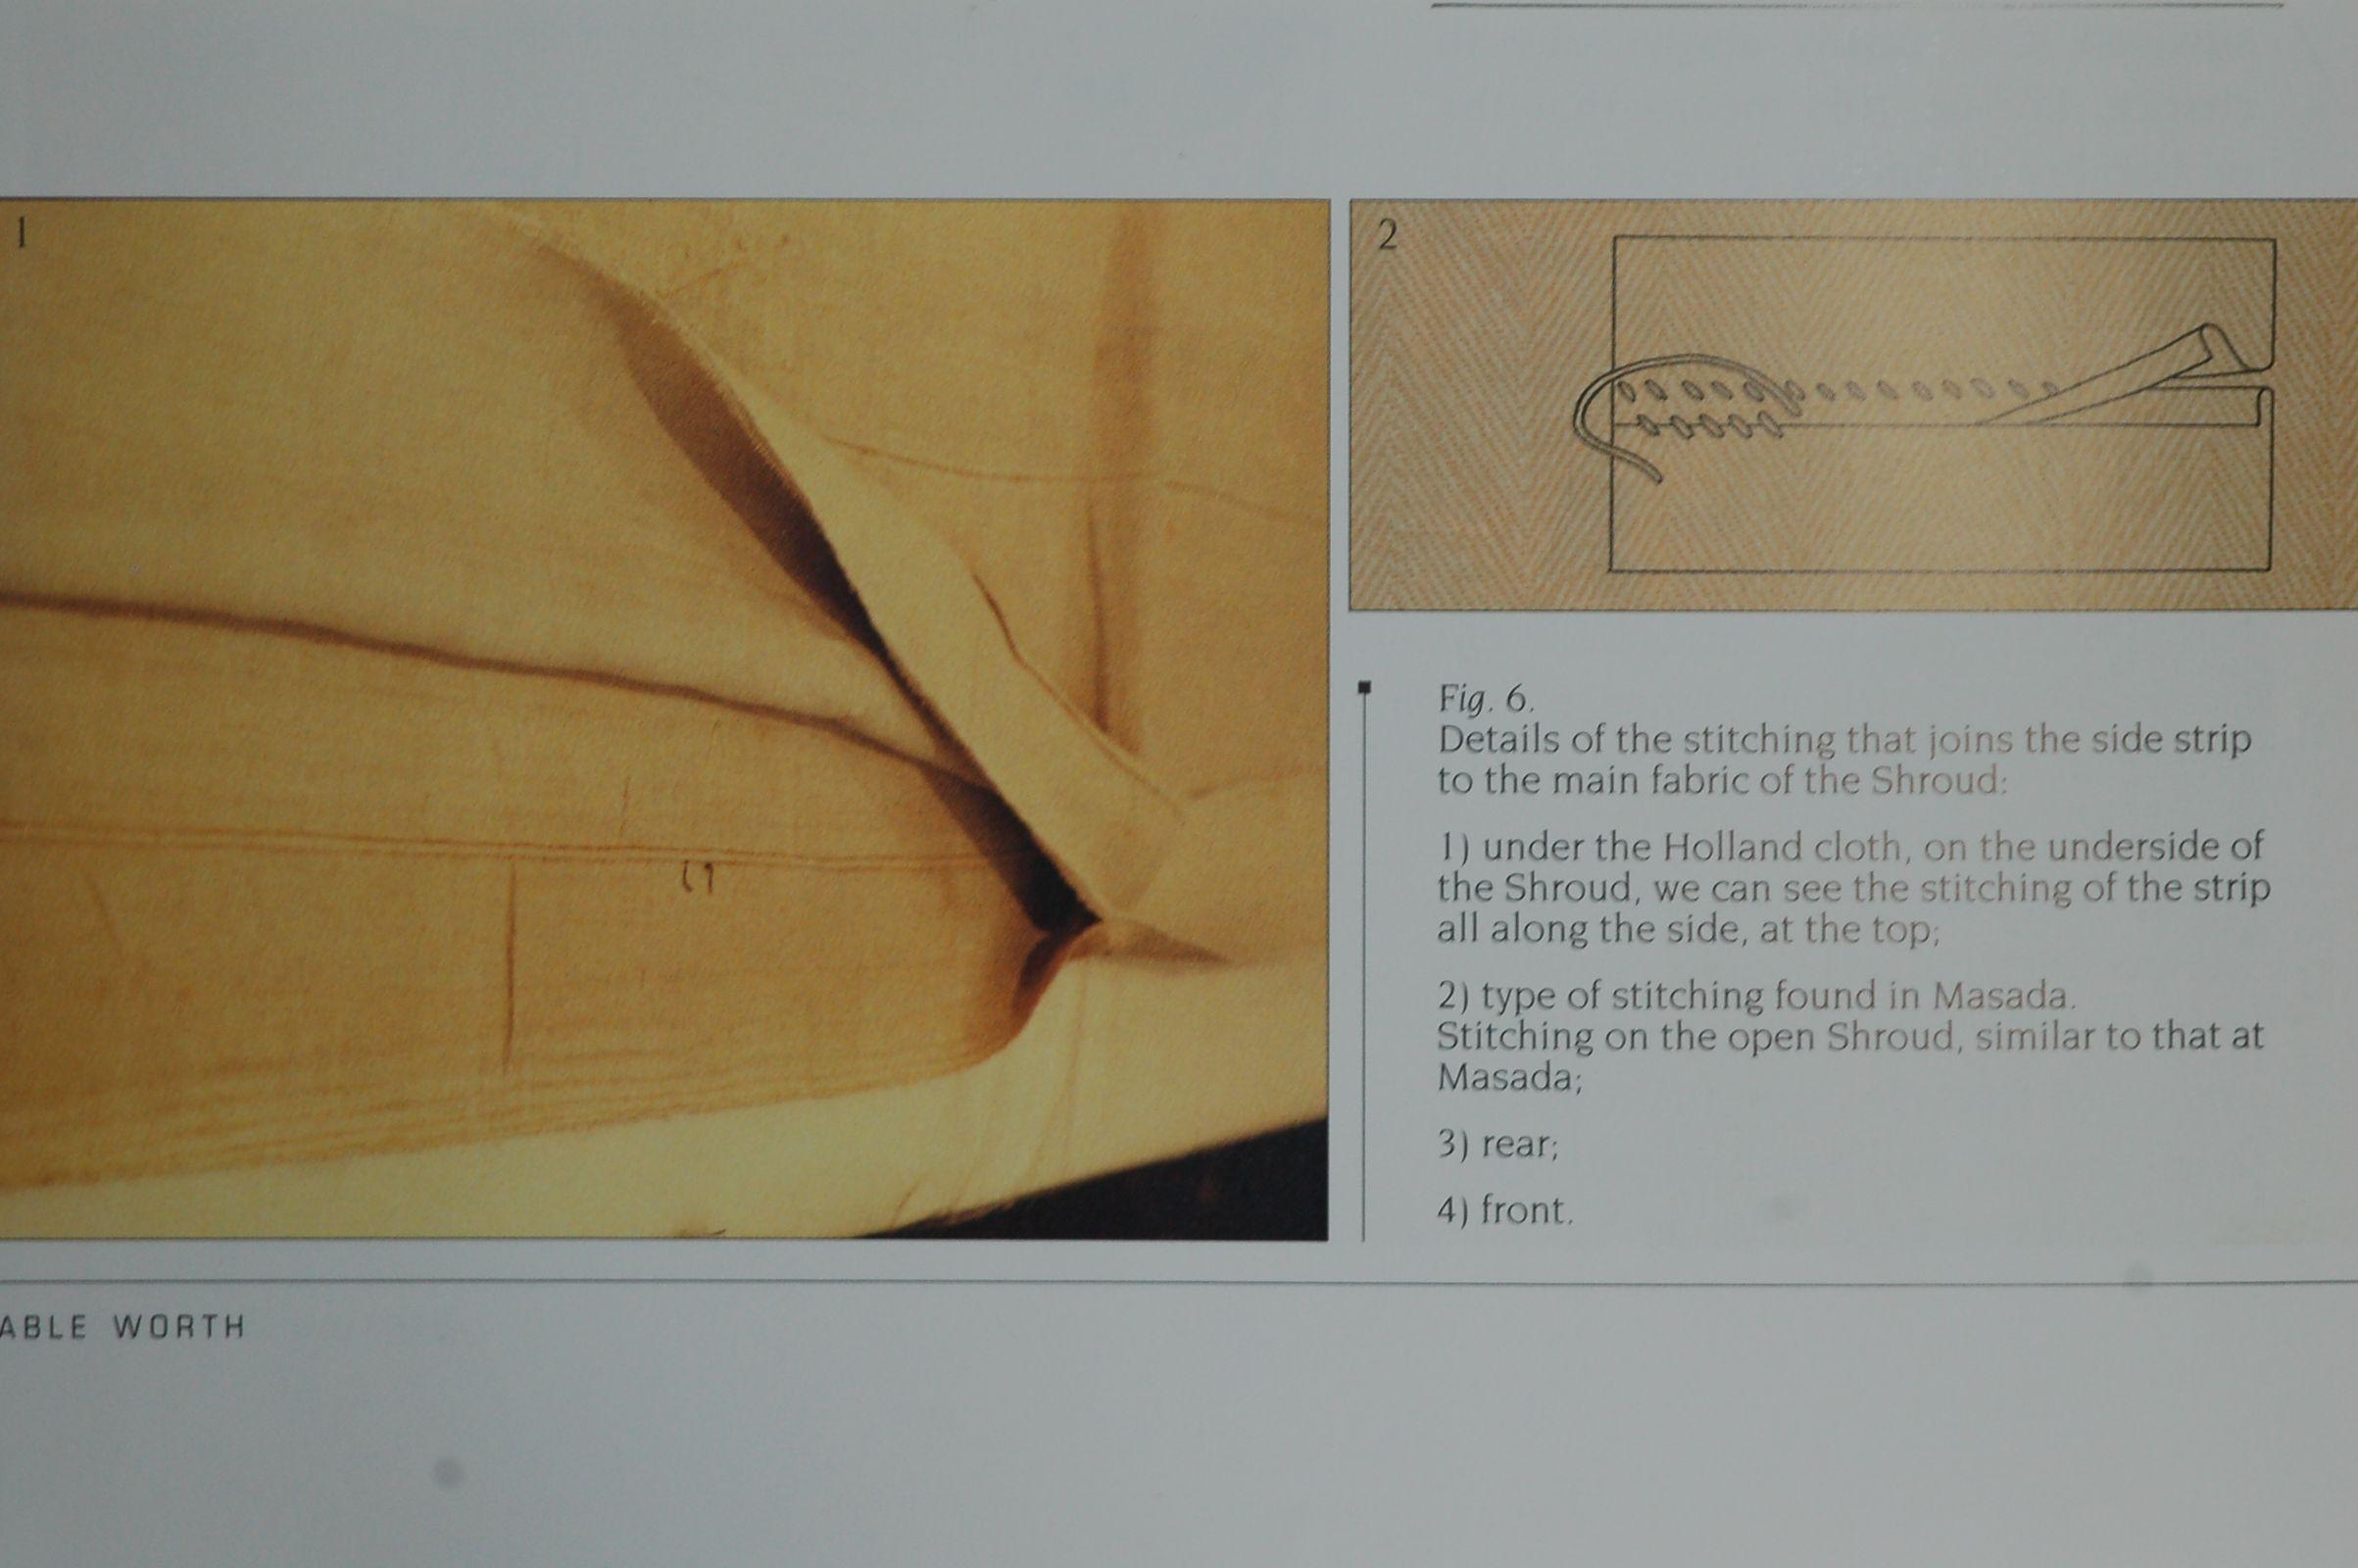 Photo F. Detail of stitching side strip Shroud